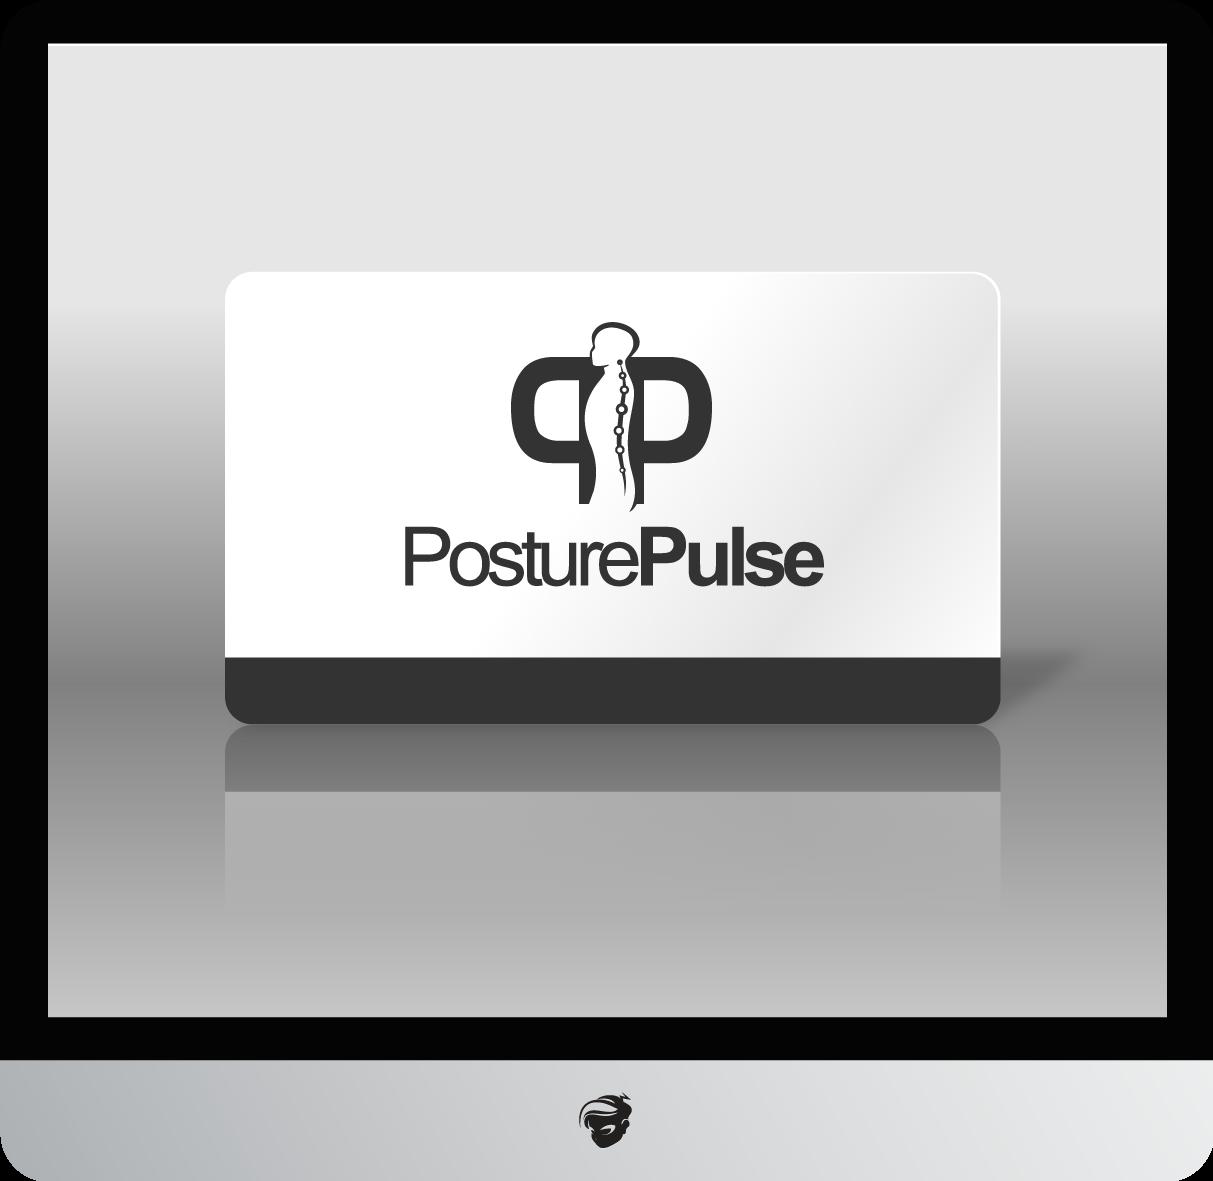 Logo Design by zesthar - Entry No. 51 in the Logo Design Contest Unique Logo Design Wanted for PosturePulse.